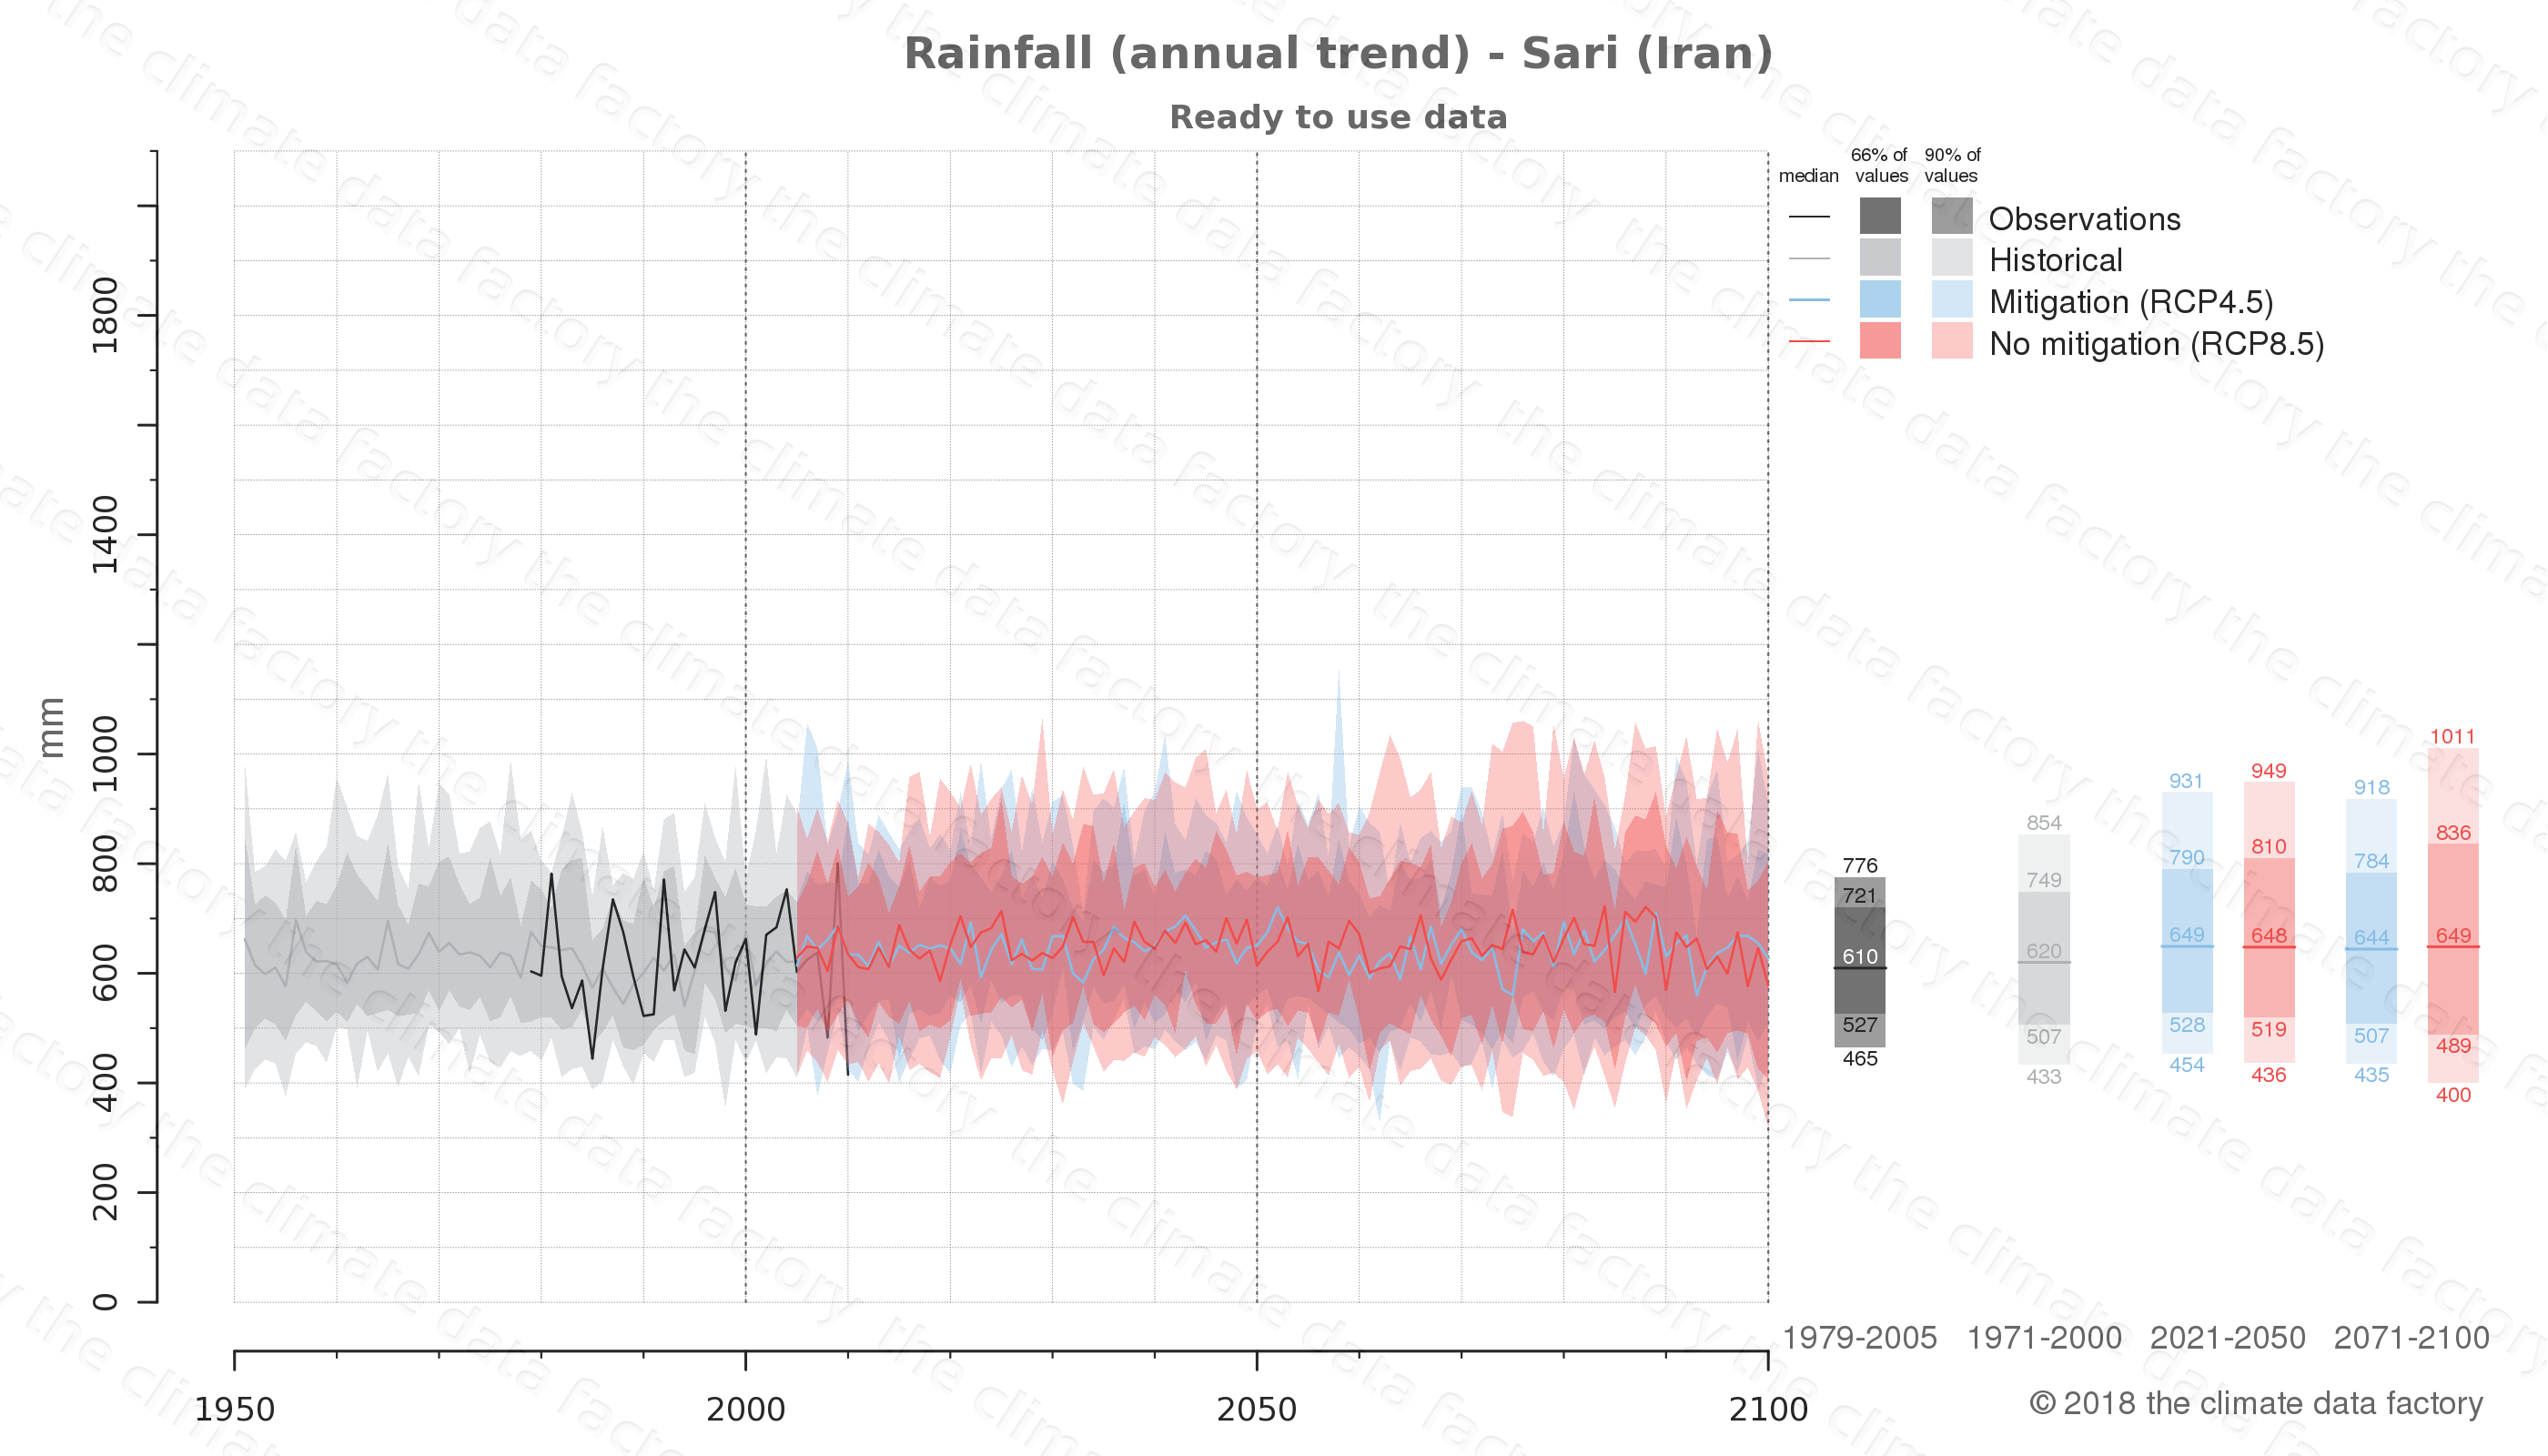 climate change data policy adaptation climate graph city data rainfall sari iran